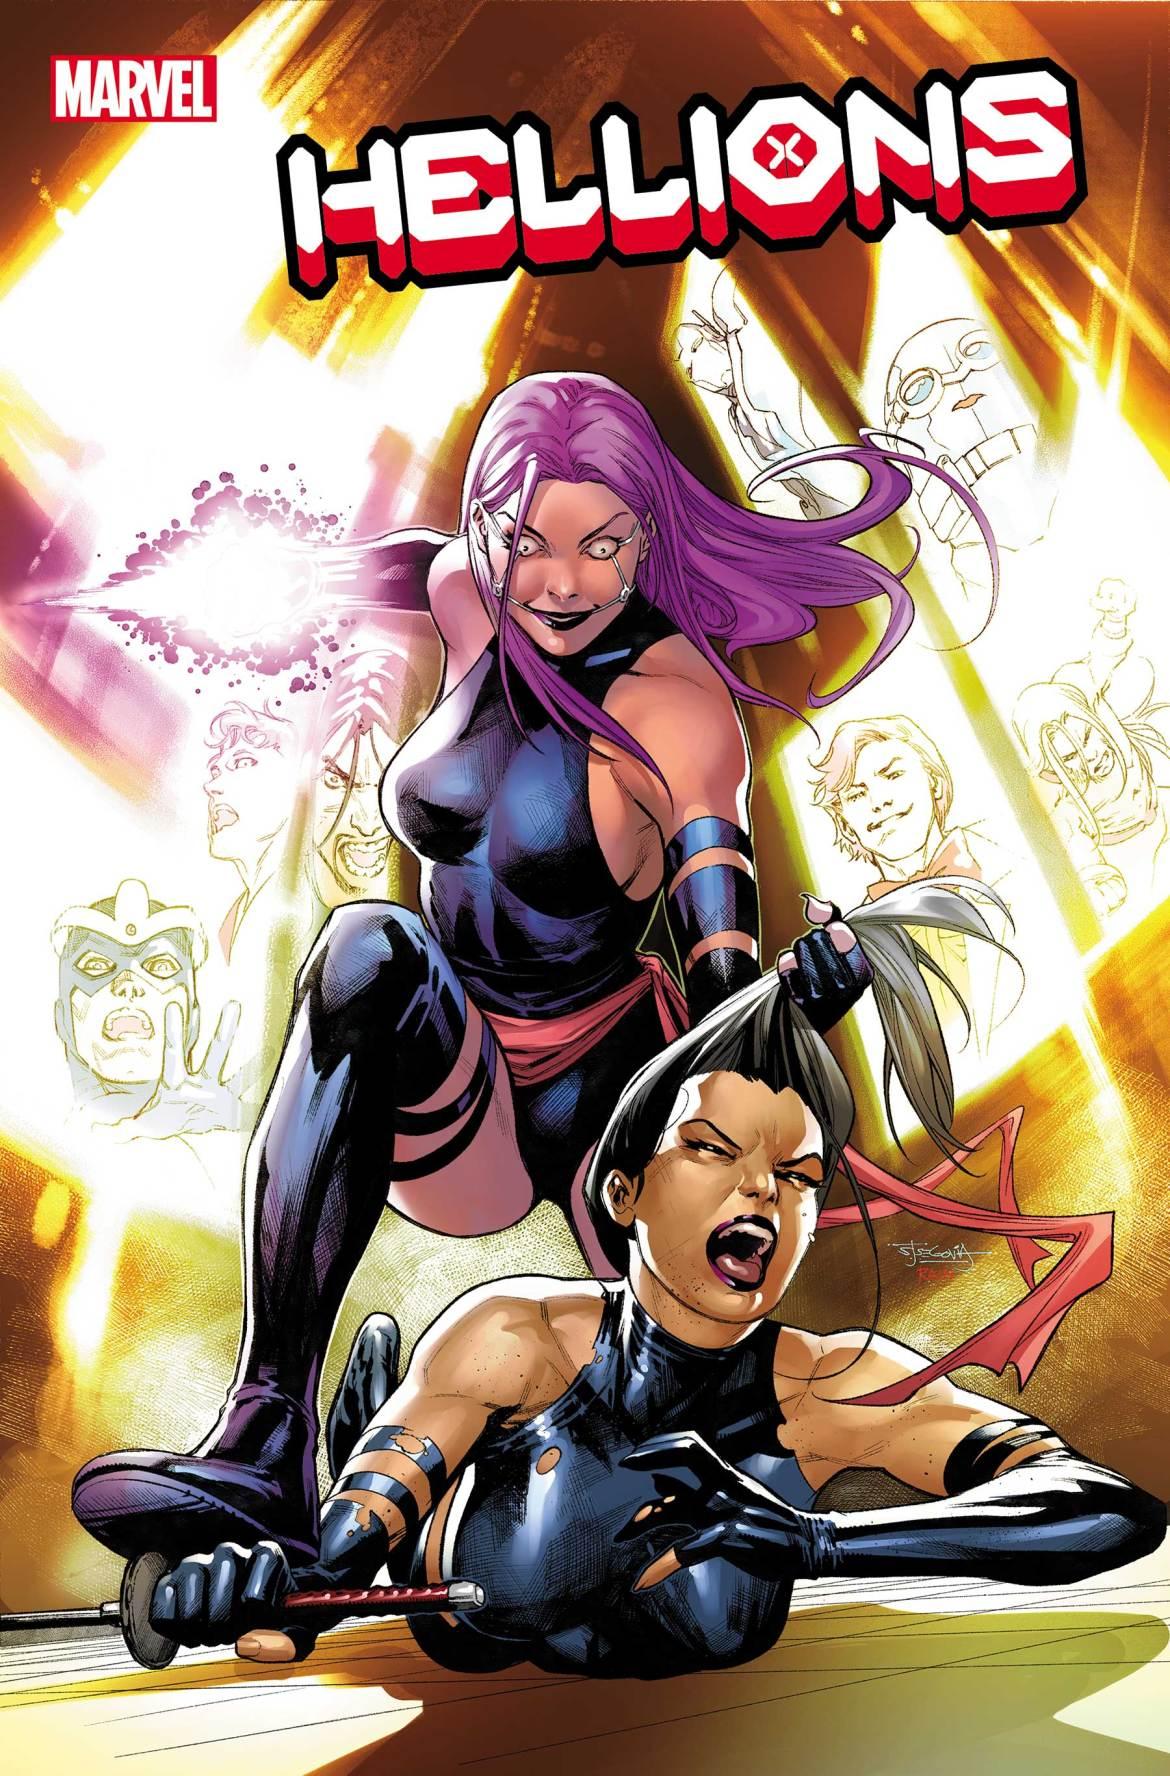 HELLIONS2020011_COL Marvel Comics May 2021 Solicitations